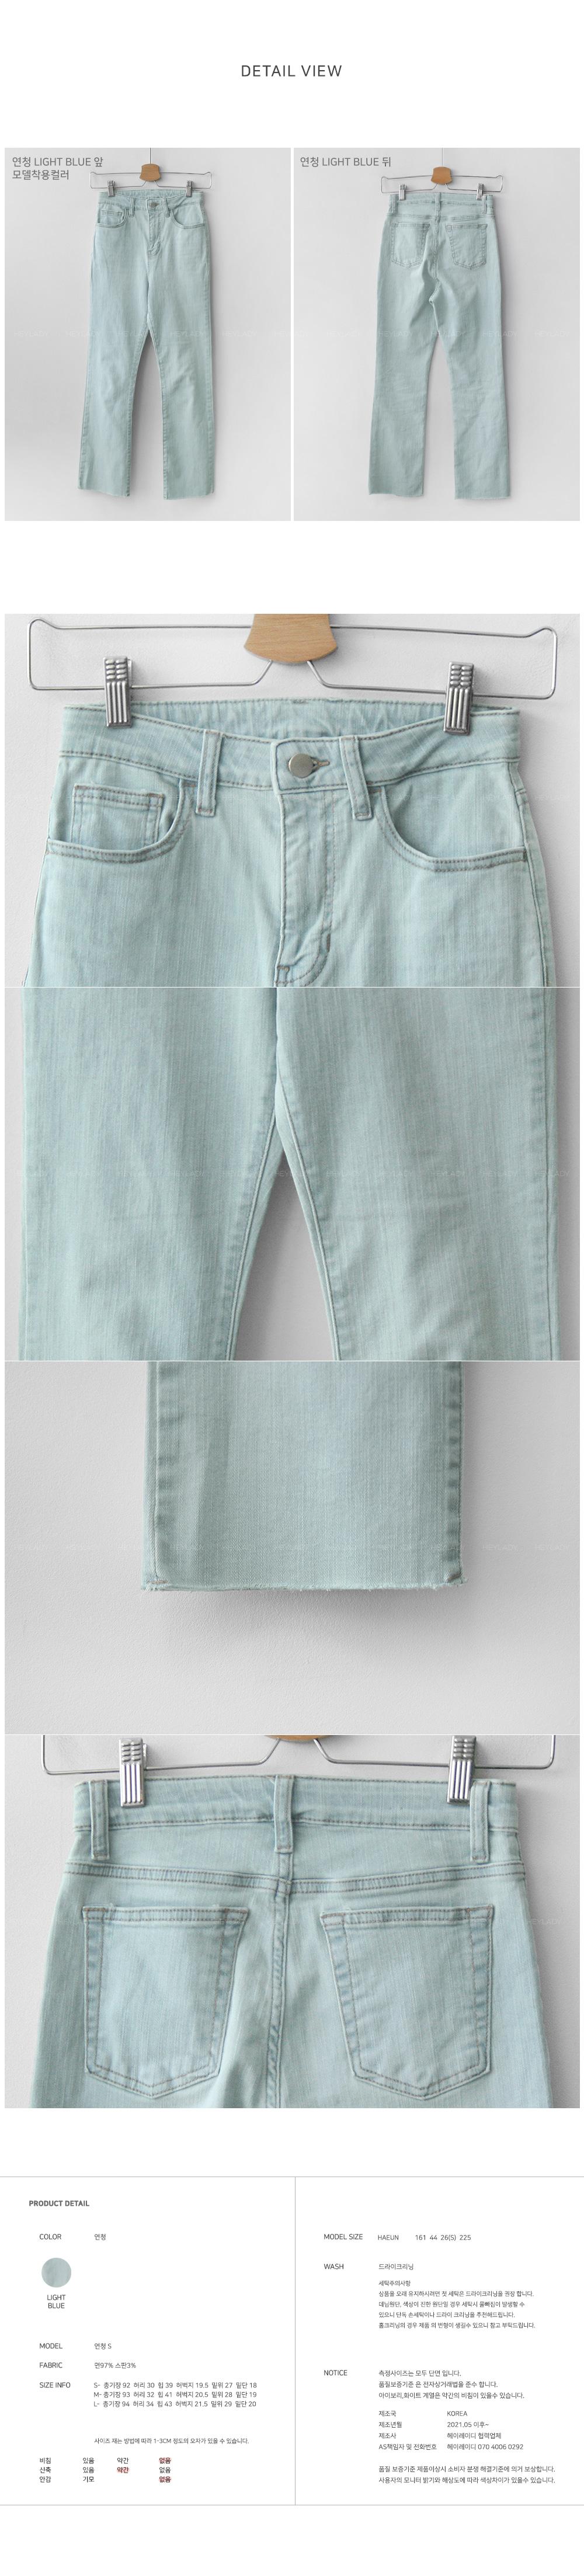 Flared Denim Pants